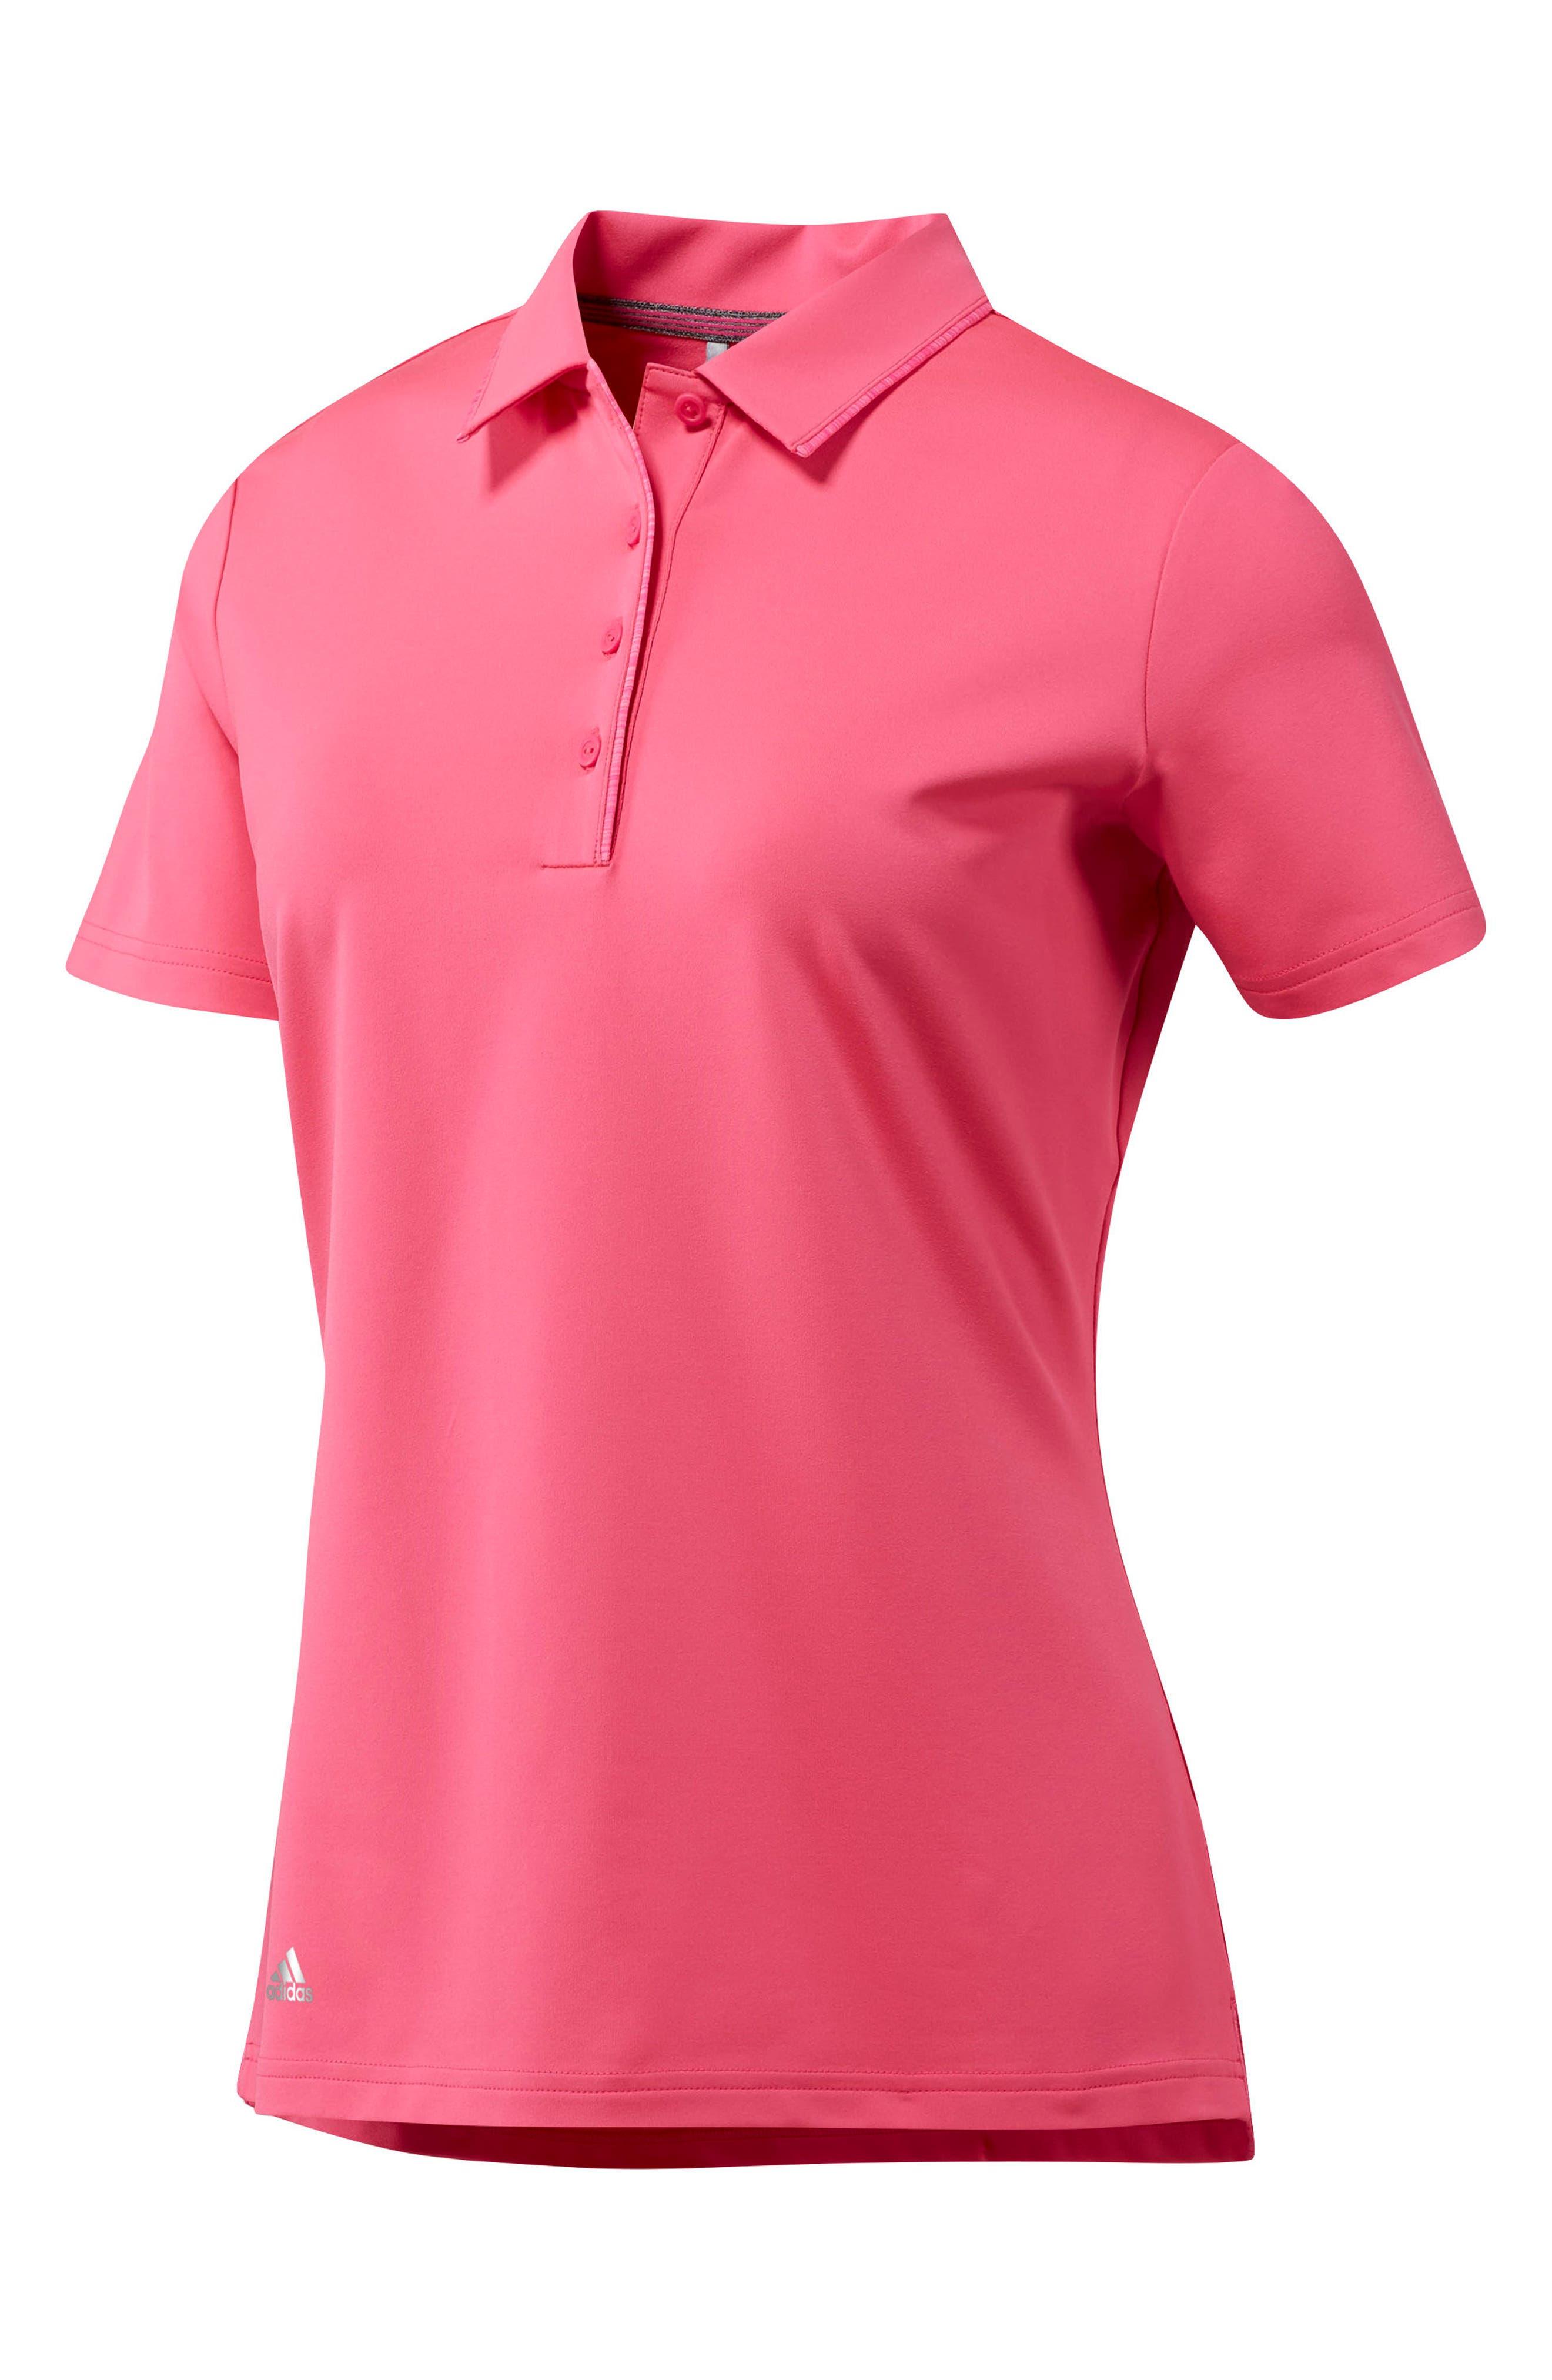 Ultimate Golf Polo,                             Main thumbnail 1, color,                             SHO PINK